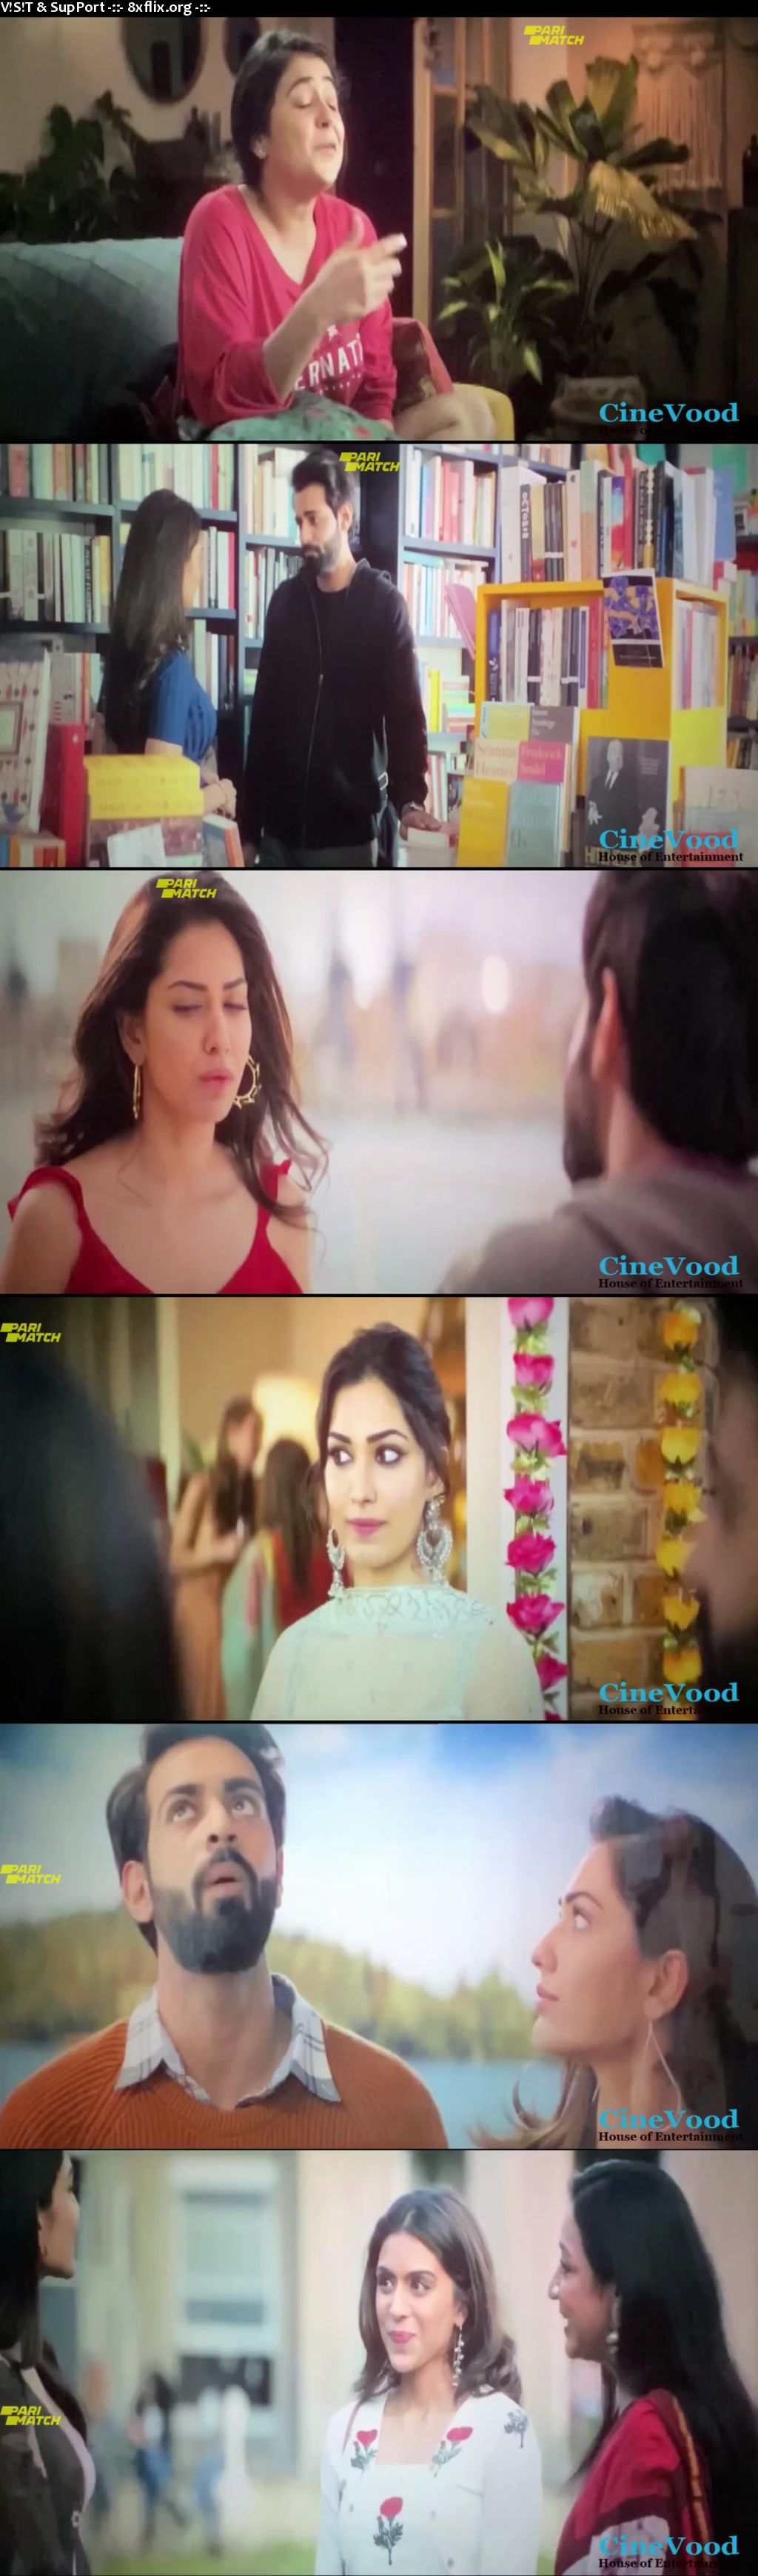 Tuesdays and Fridays 2021 Full Hindi Movie Download 720p 480p HD